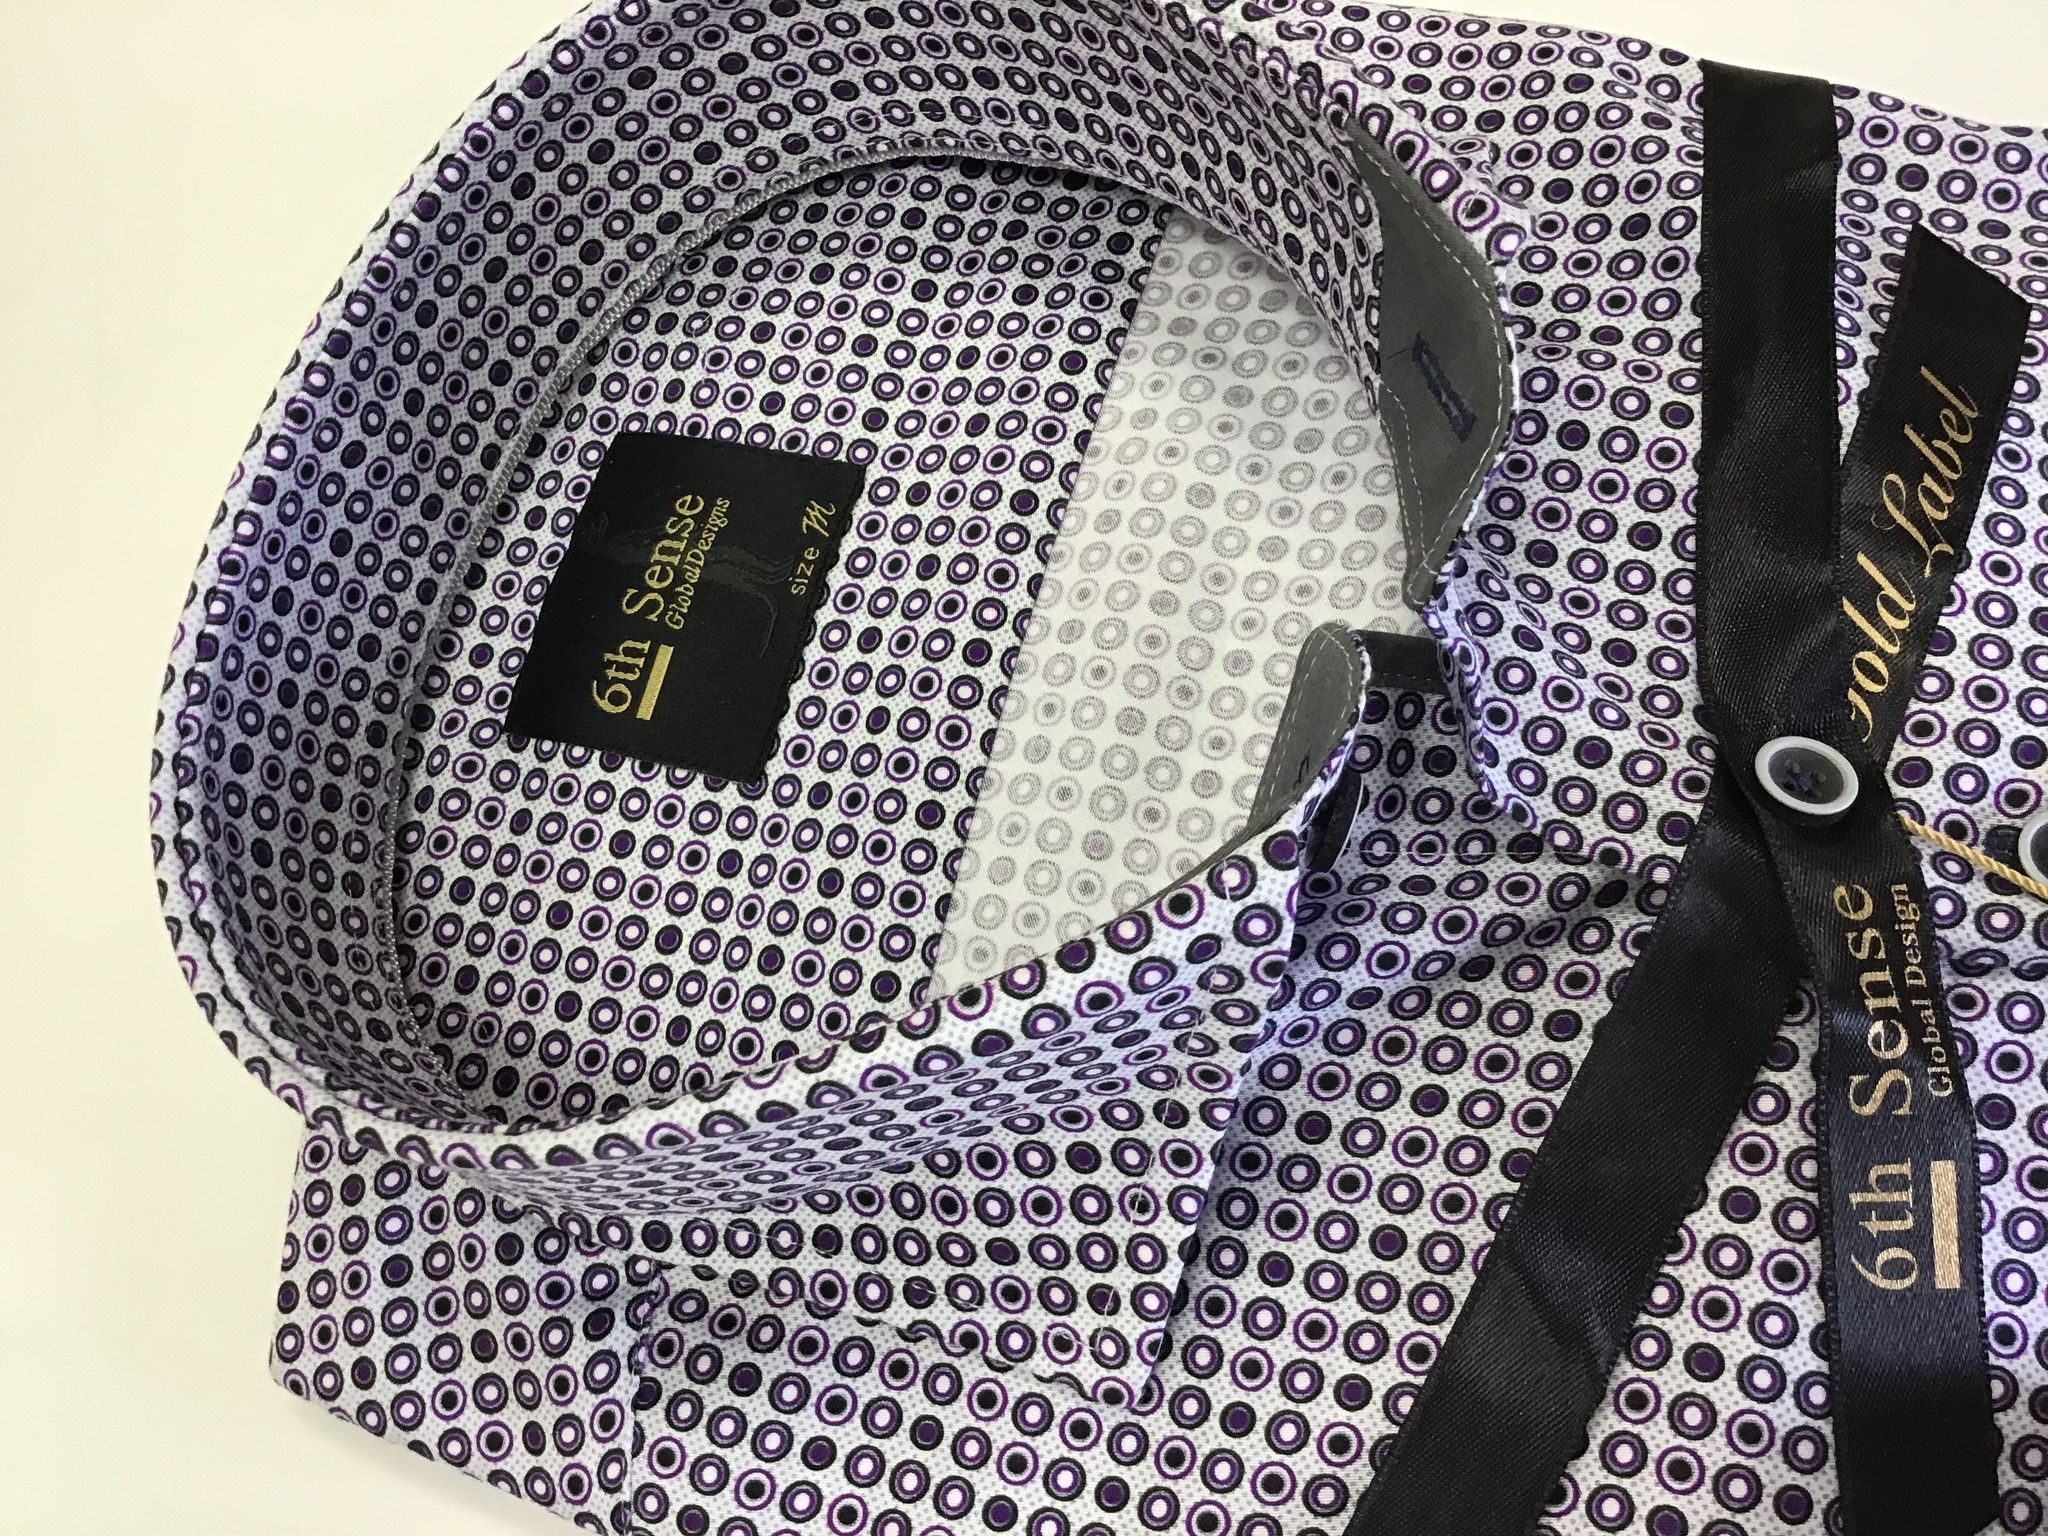 6th sense Circle print shirt